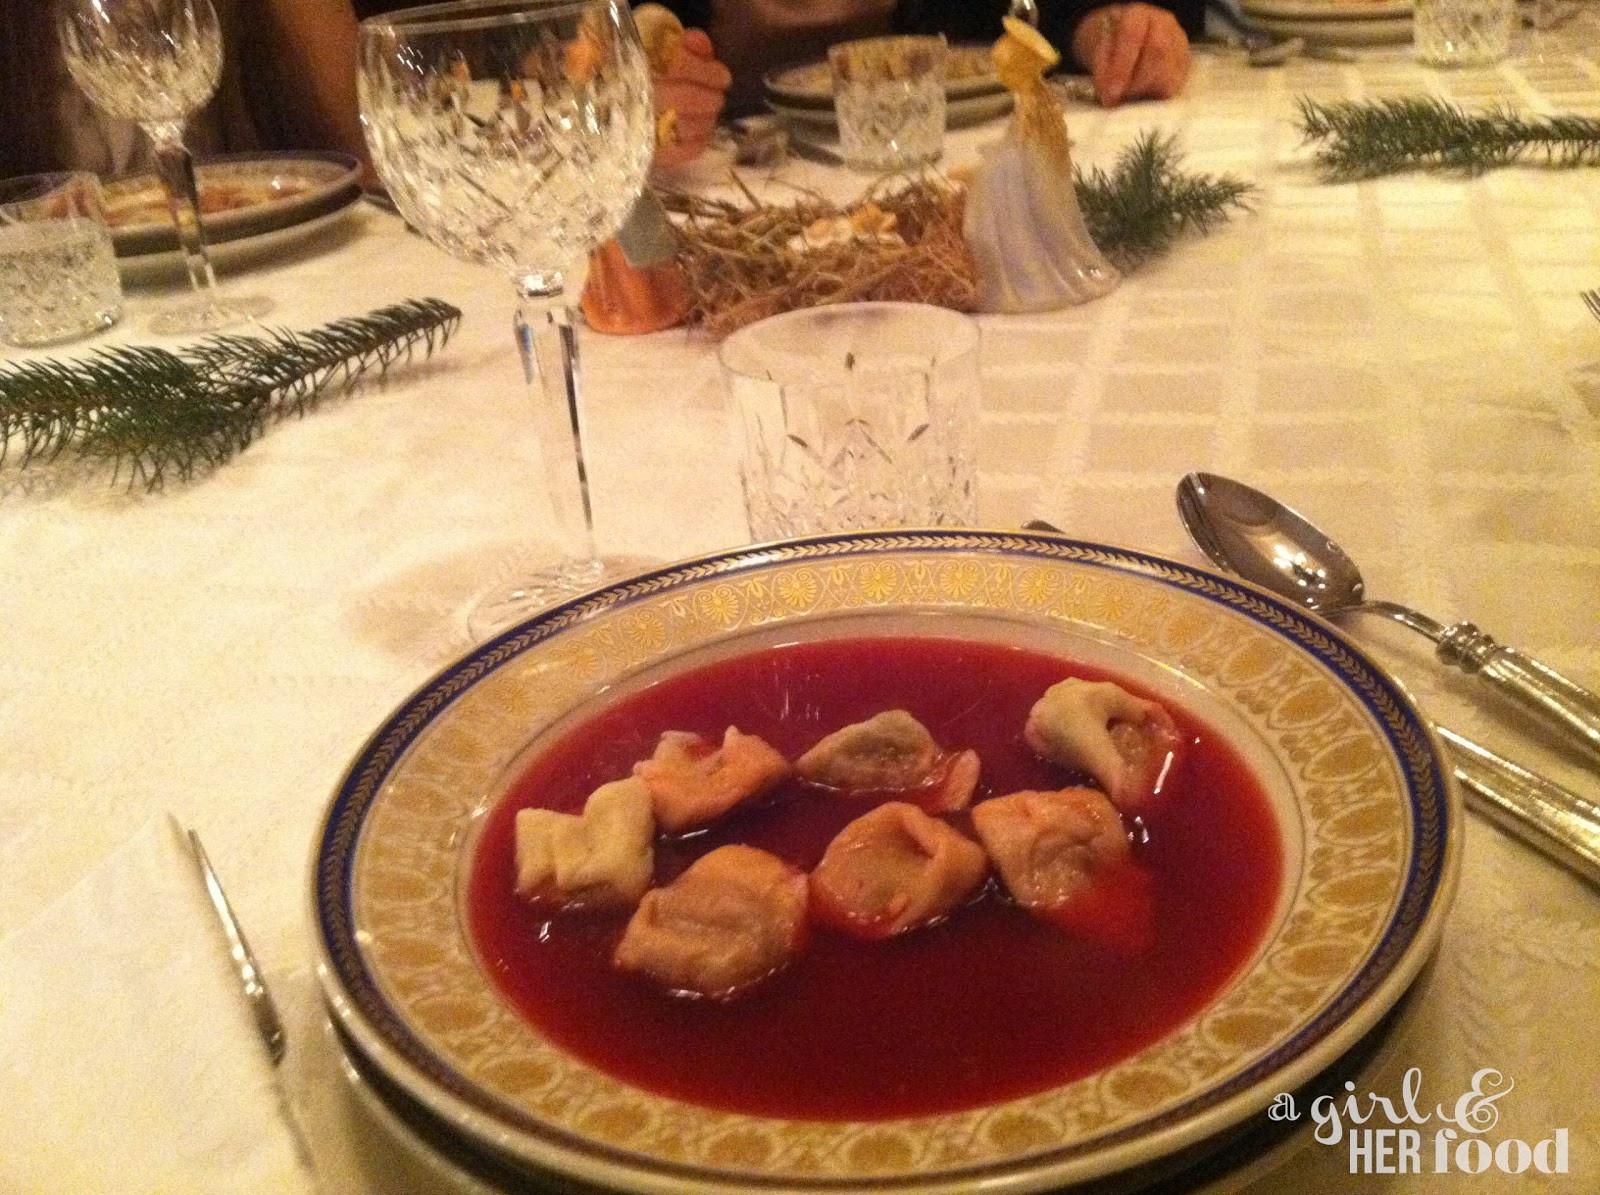 Polish Christmas Dinner  A Girl & Her Food Polish Christmas Eve Dinner